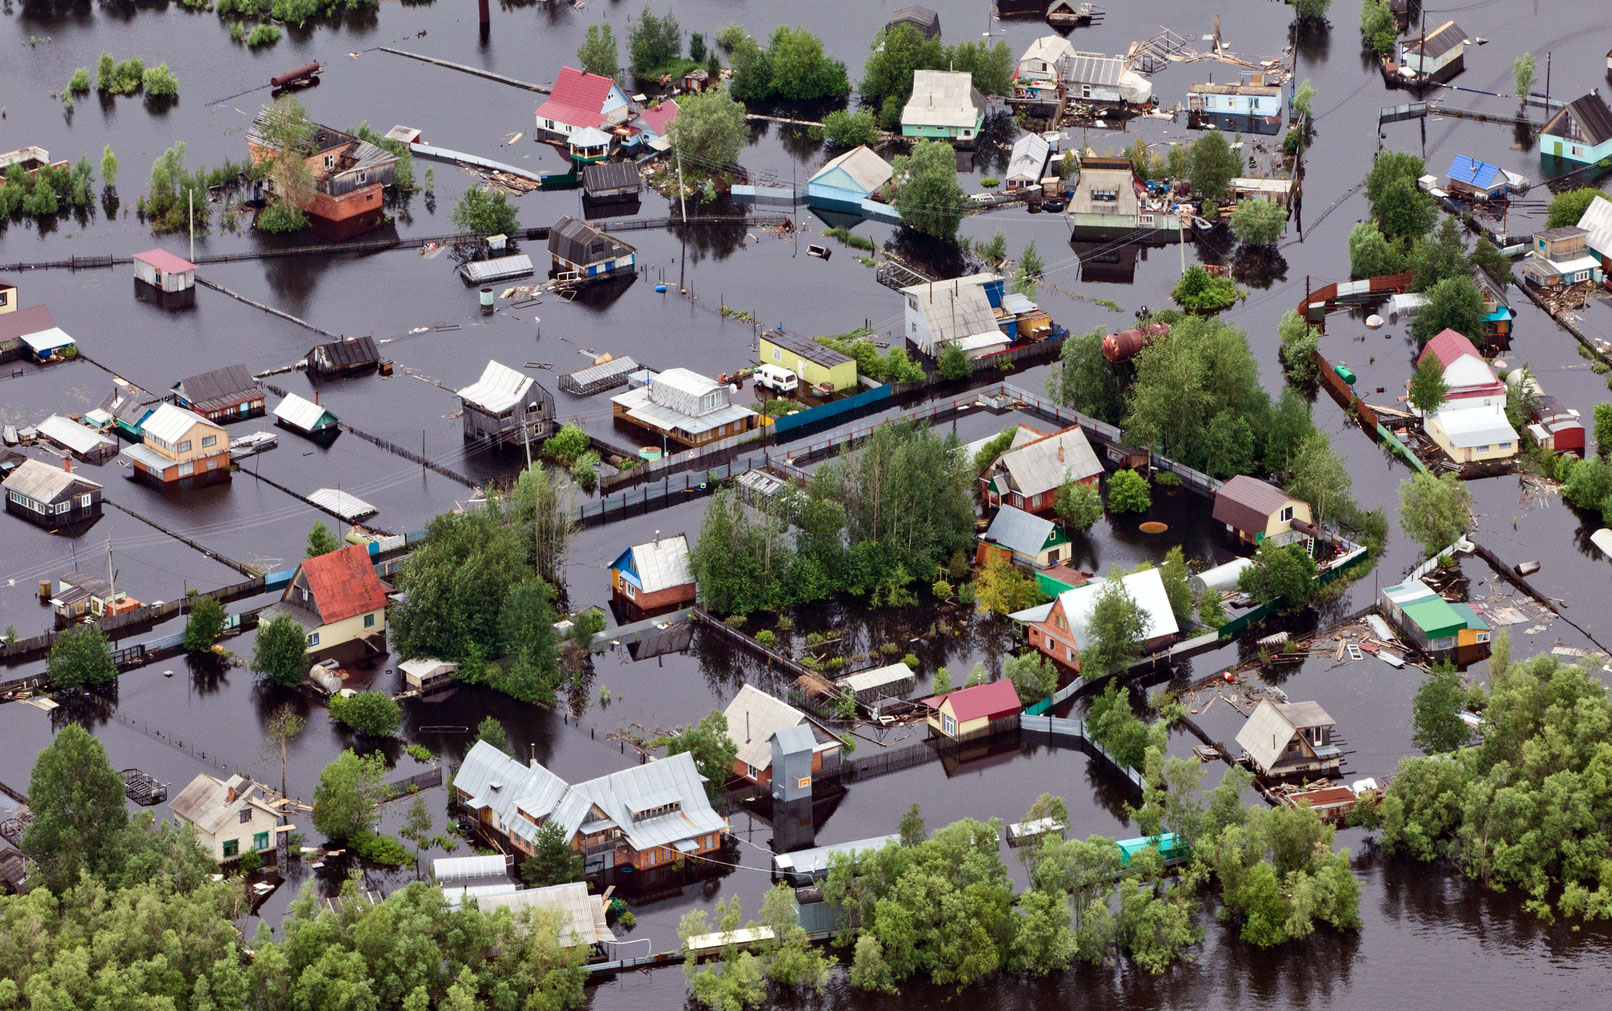 drone-assurance-sinistre-drone-inondation-incendie